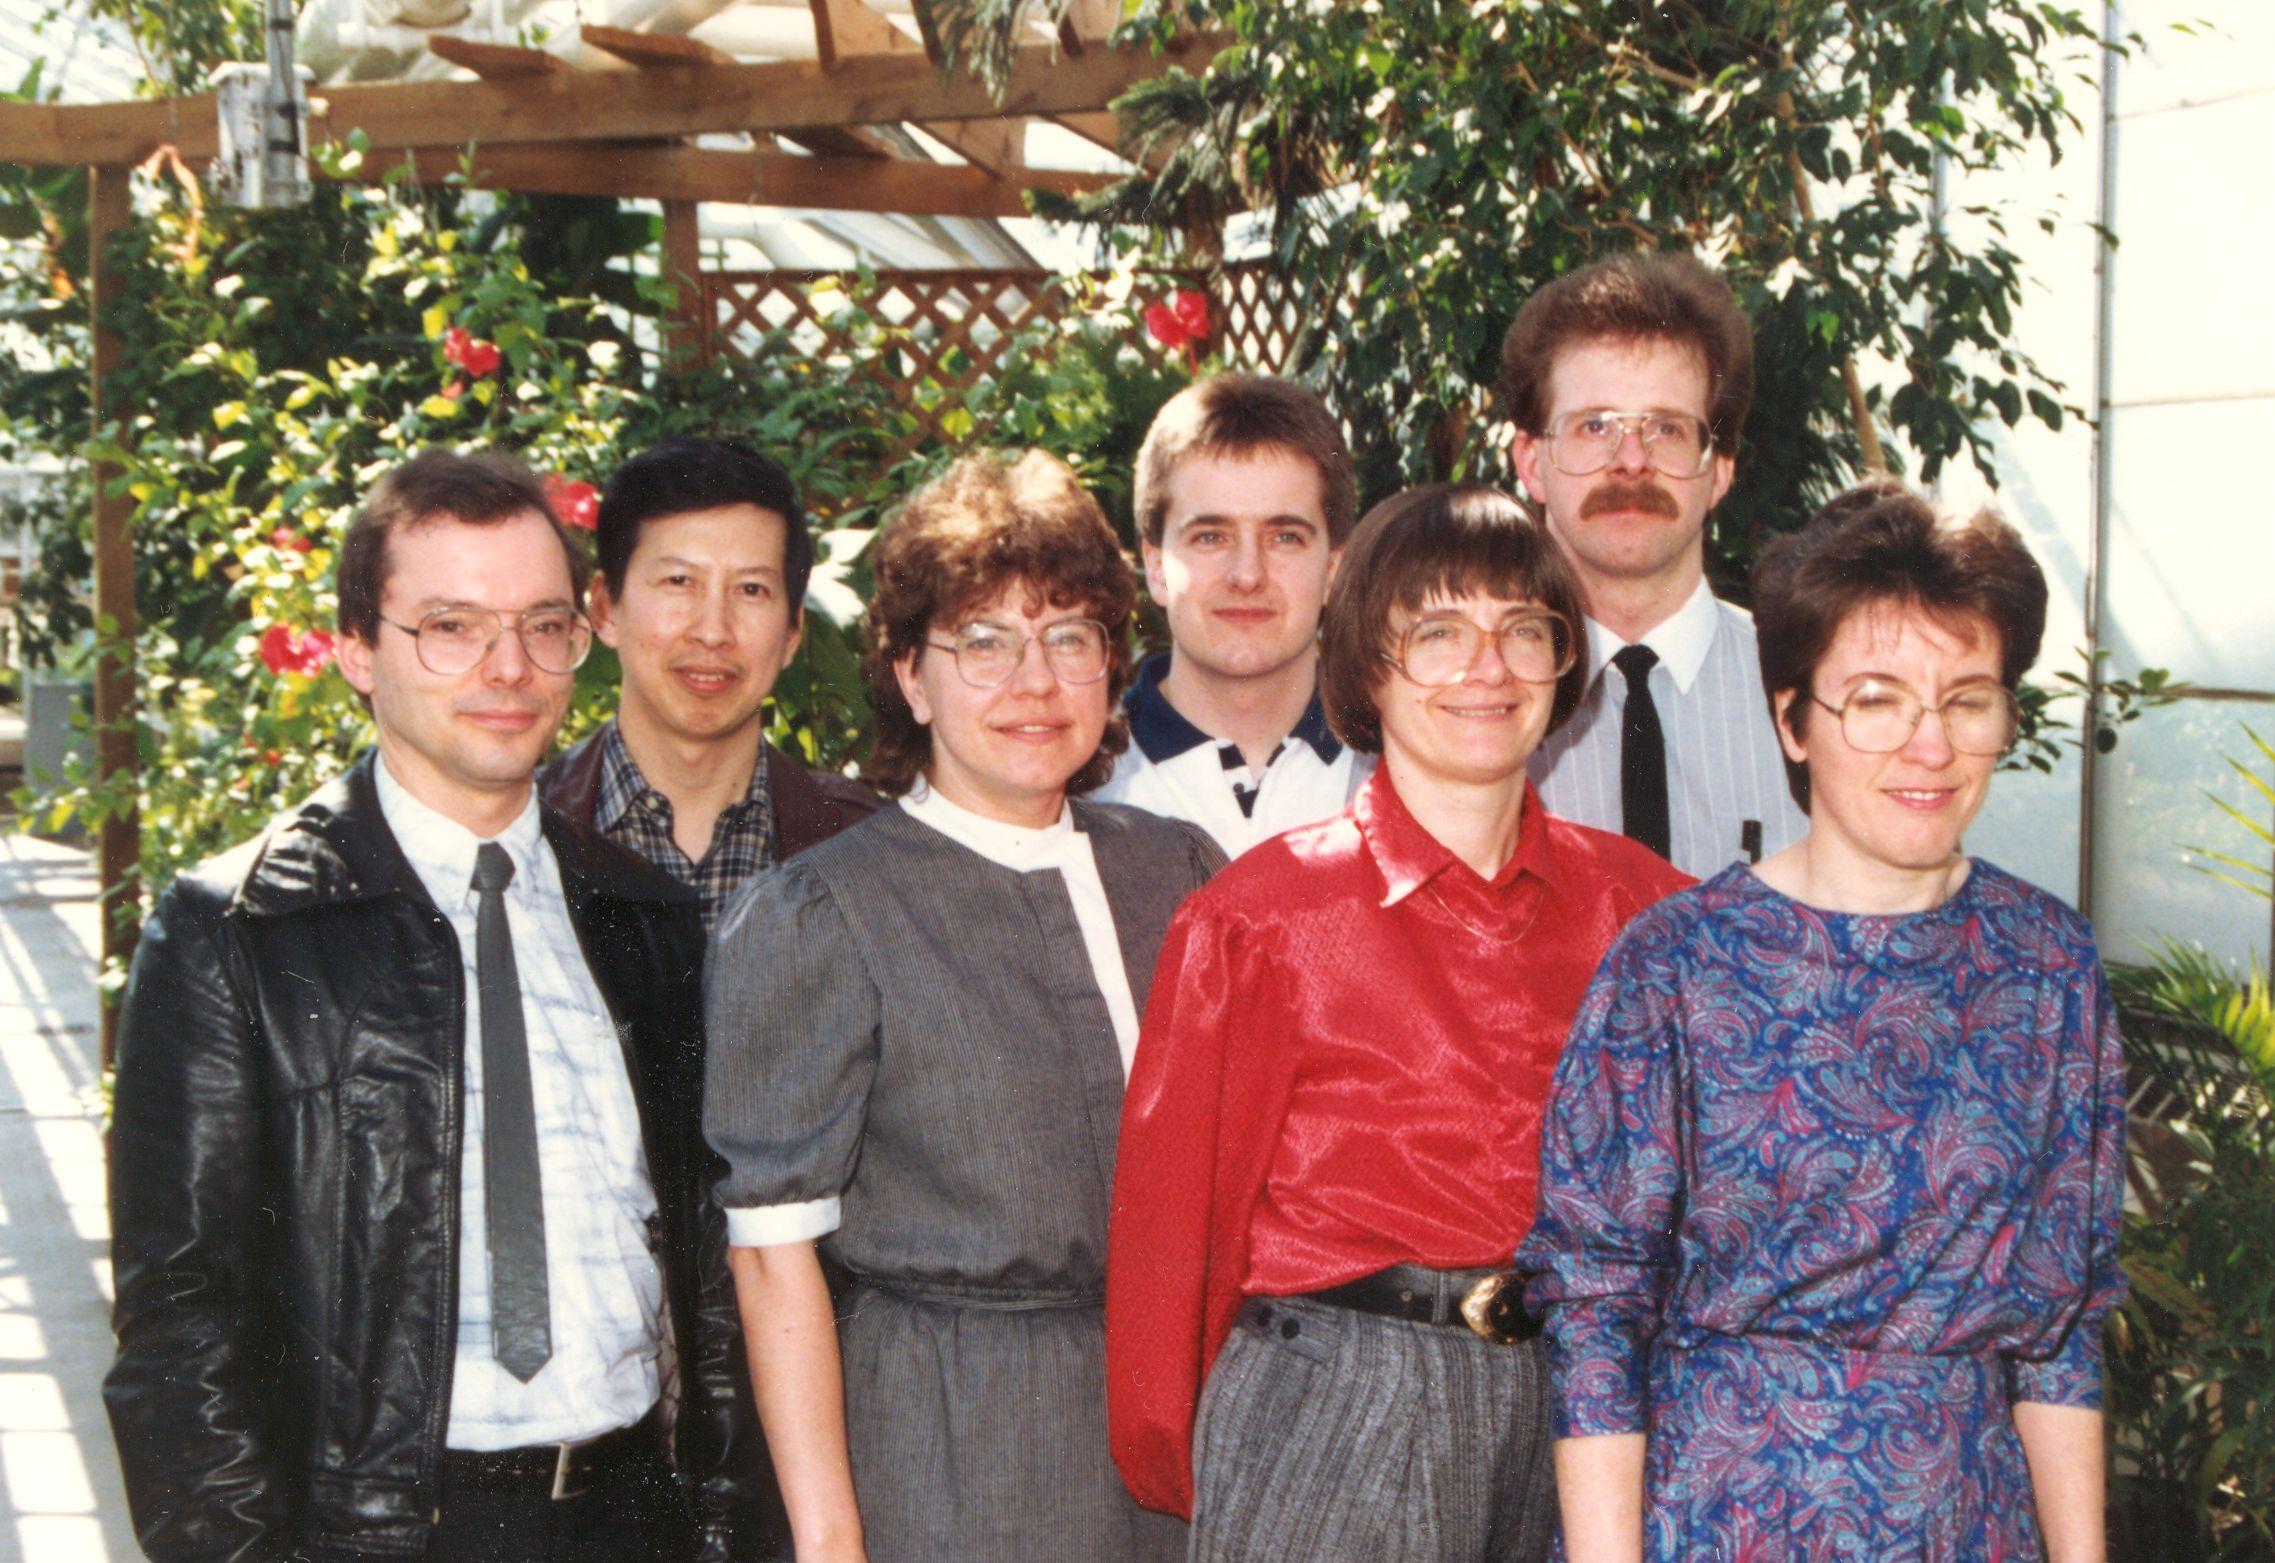 1988-alimentaire-Lay Ly-Robert Vaillancourt-Robert Simpson-Claude Bérubé-Reine Gagnon-Micheine De